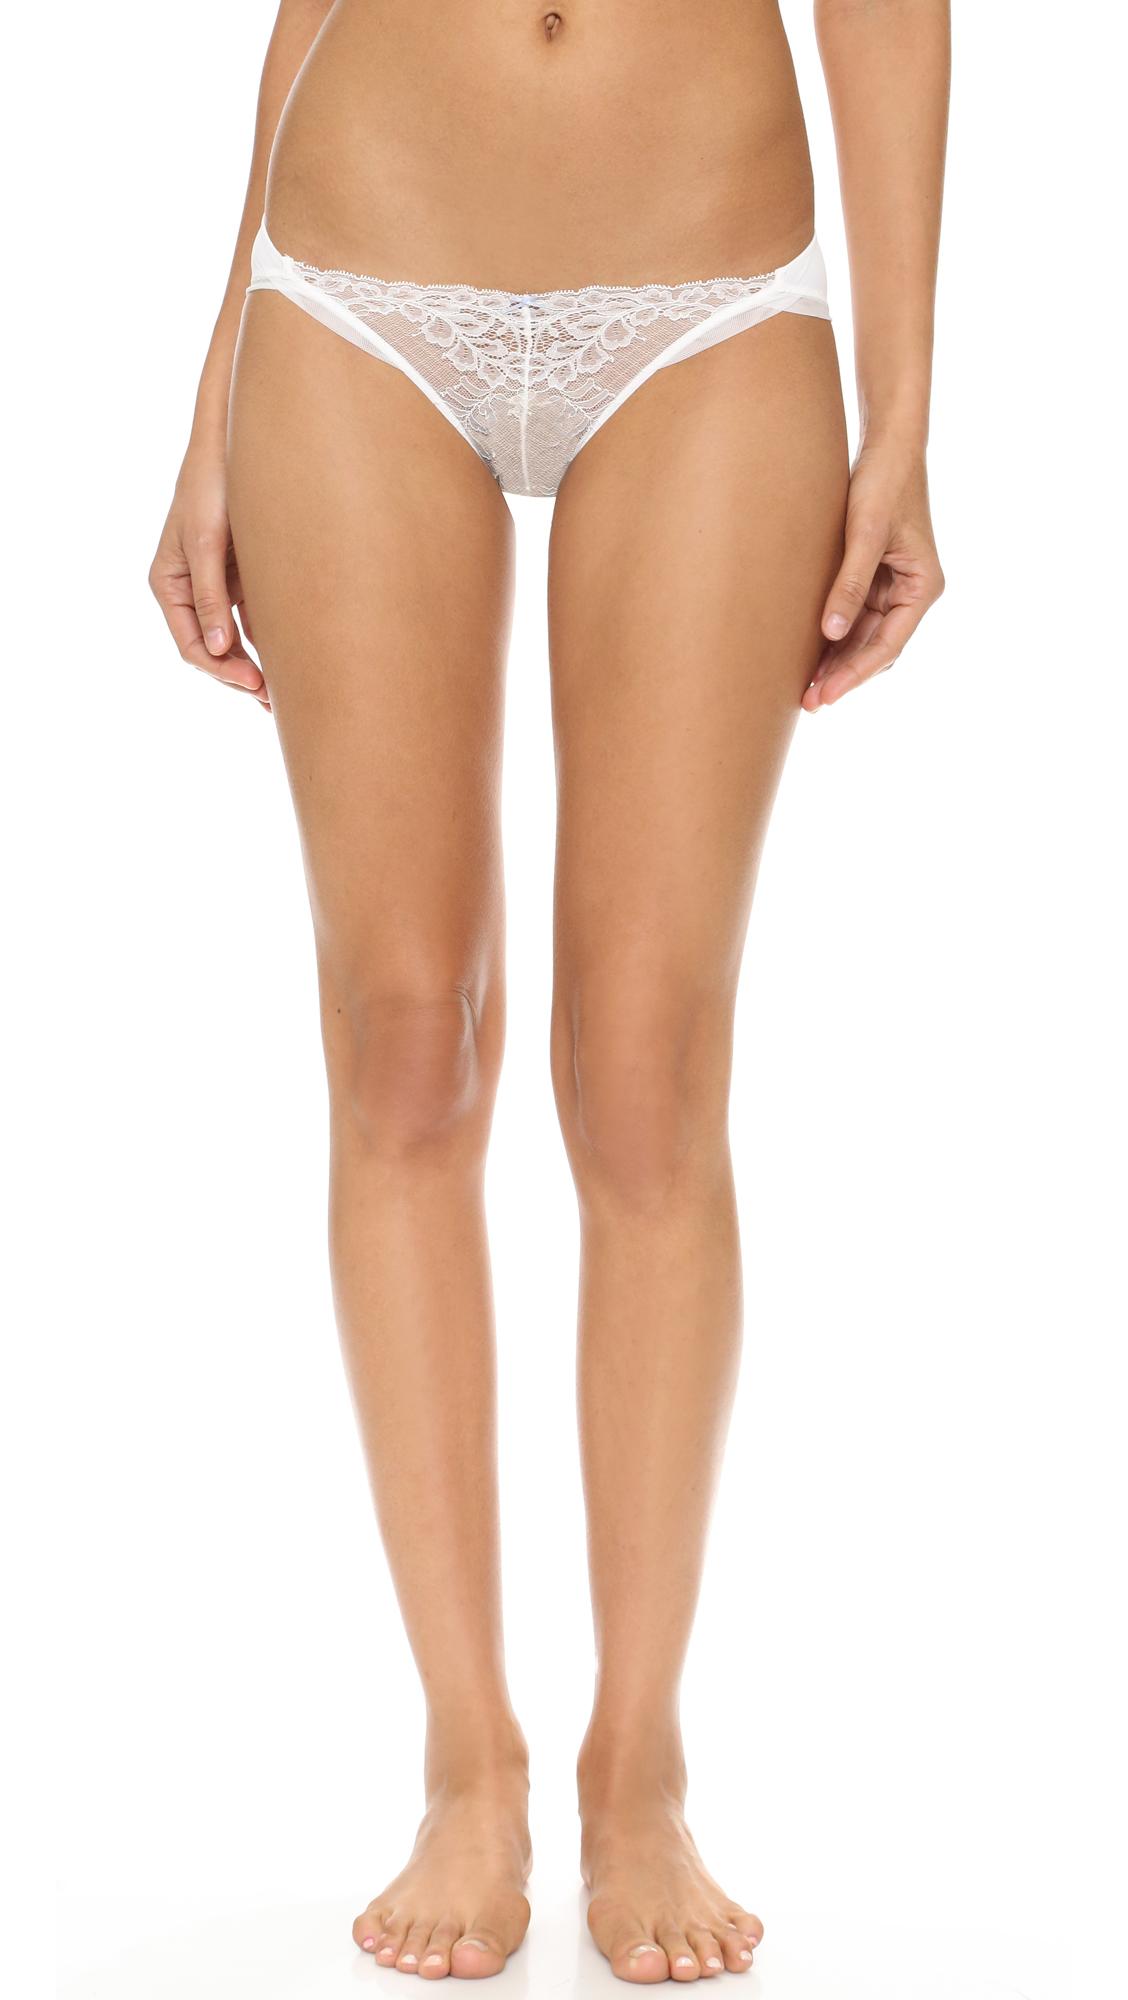 Skarlett Blue Socialite French Bikini Briefs - Light Ivory